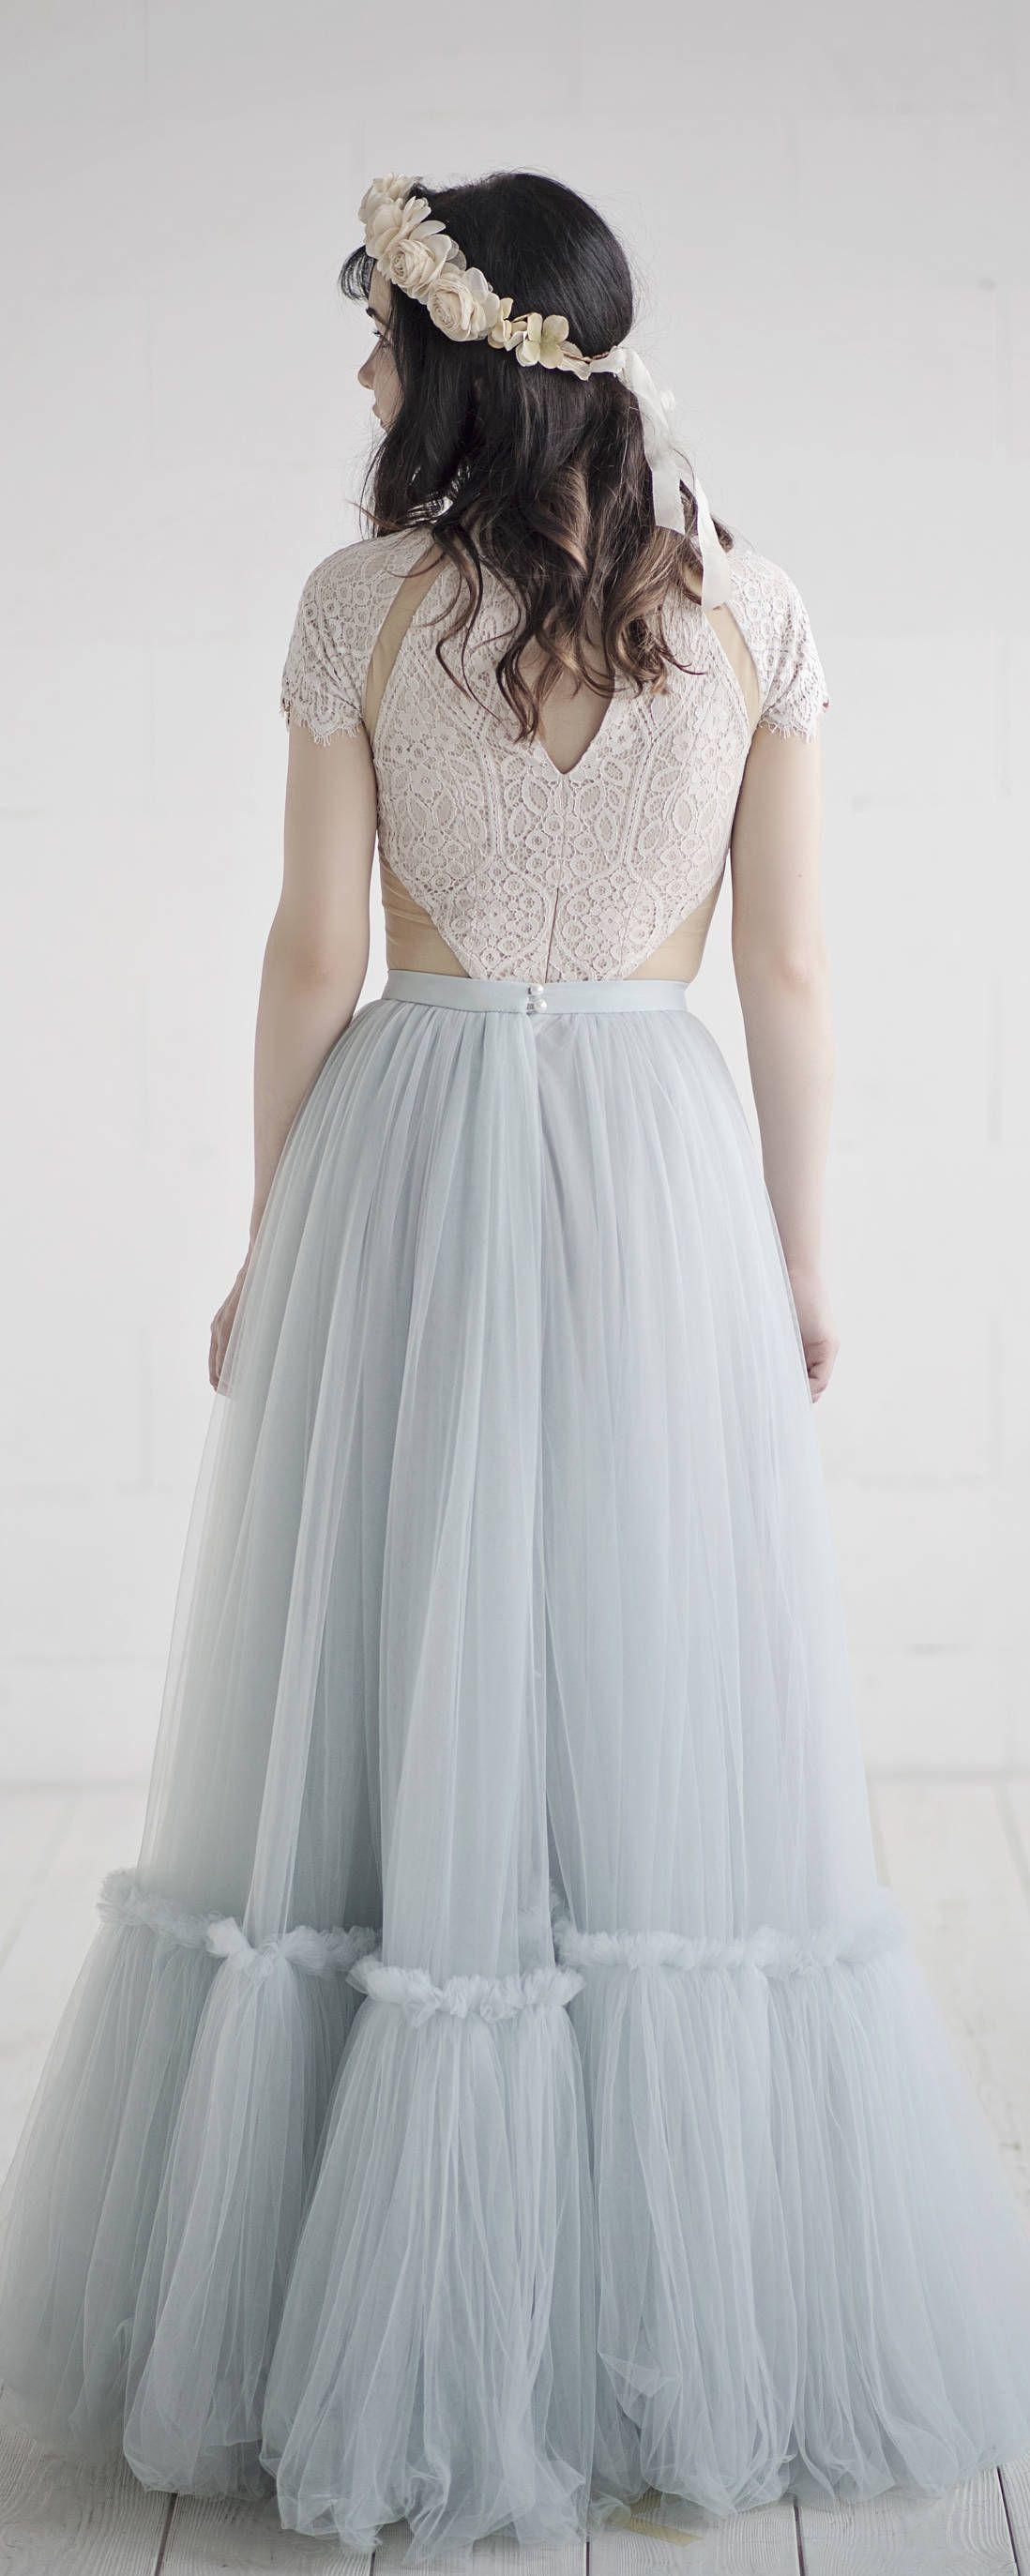 Dolores bohemian wedding dress boho wedding gown southwestern